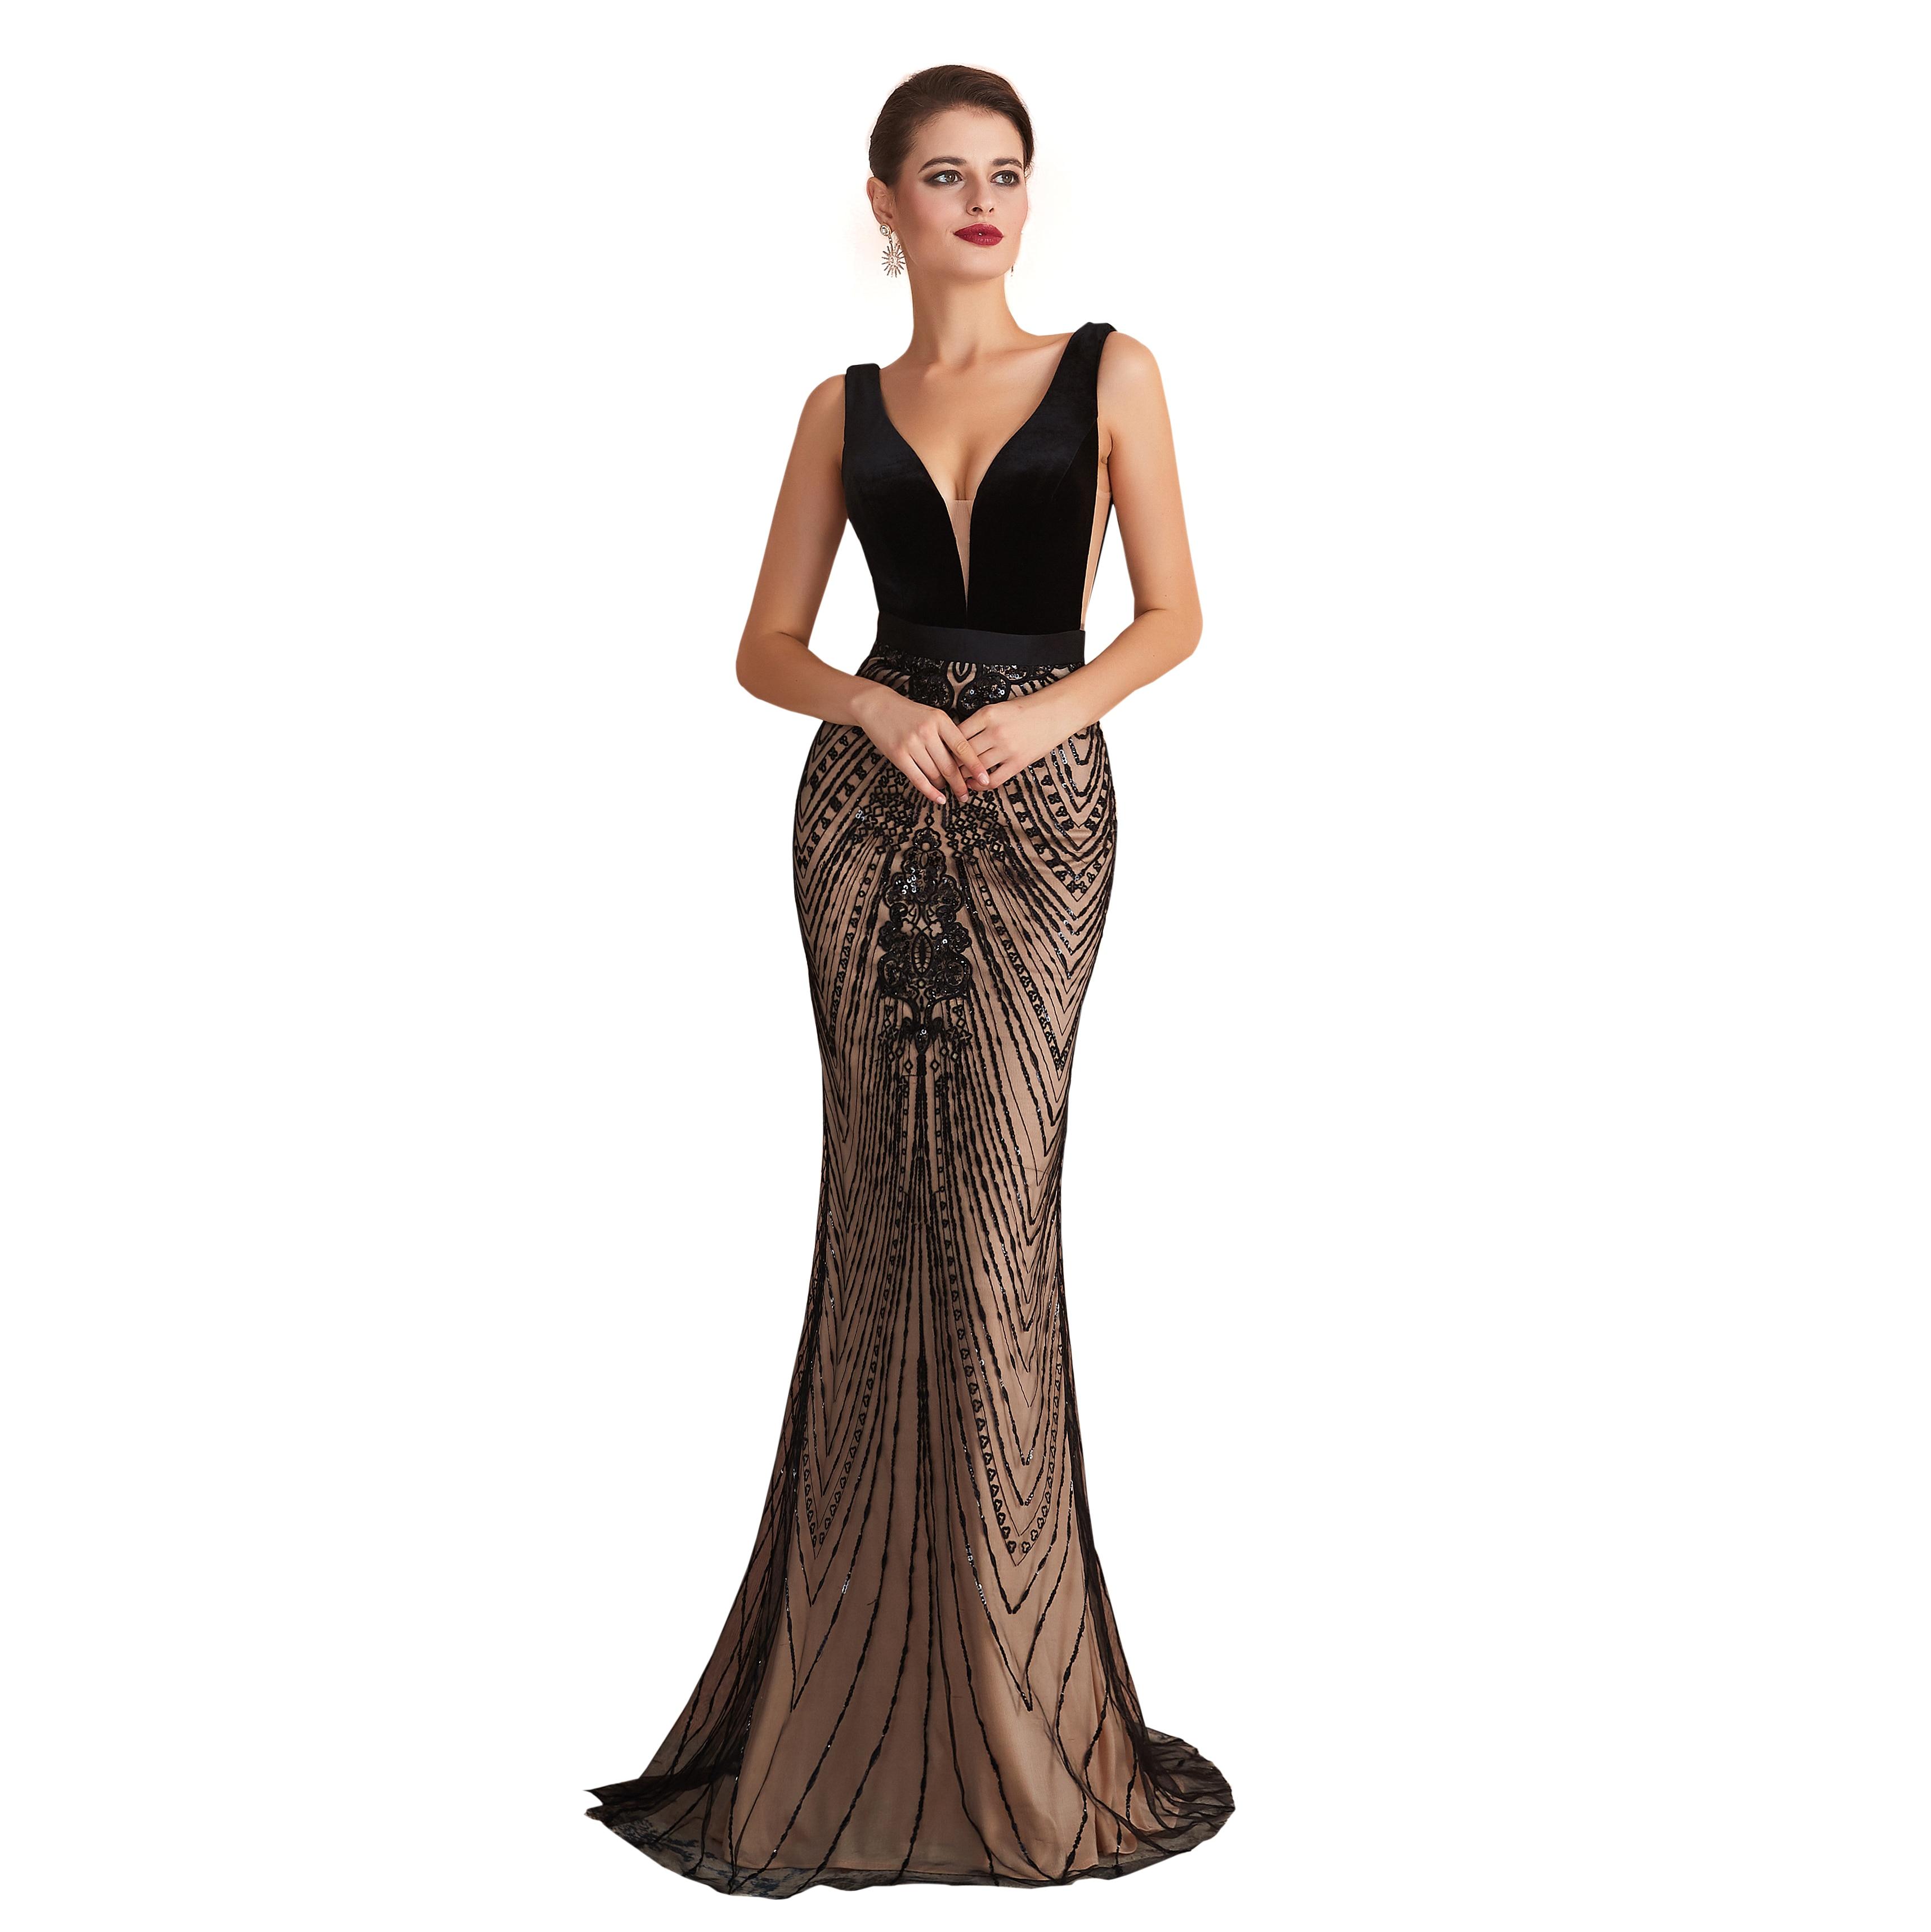 NEW 2020 St.Des Mermaid V-neck Russian Black Champagne Sequins Beading Sleeveless Elegant Floor Length Evening Dress Party Dress